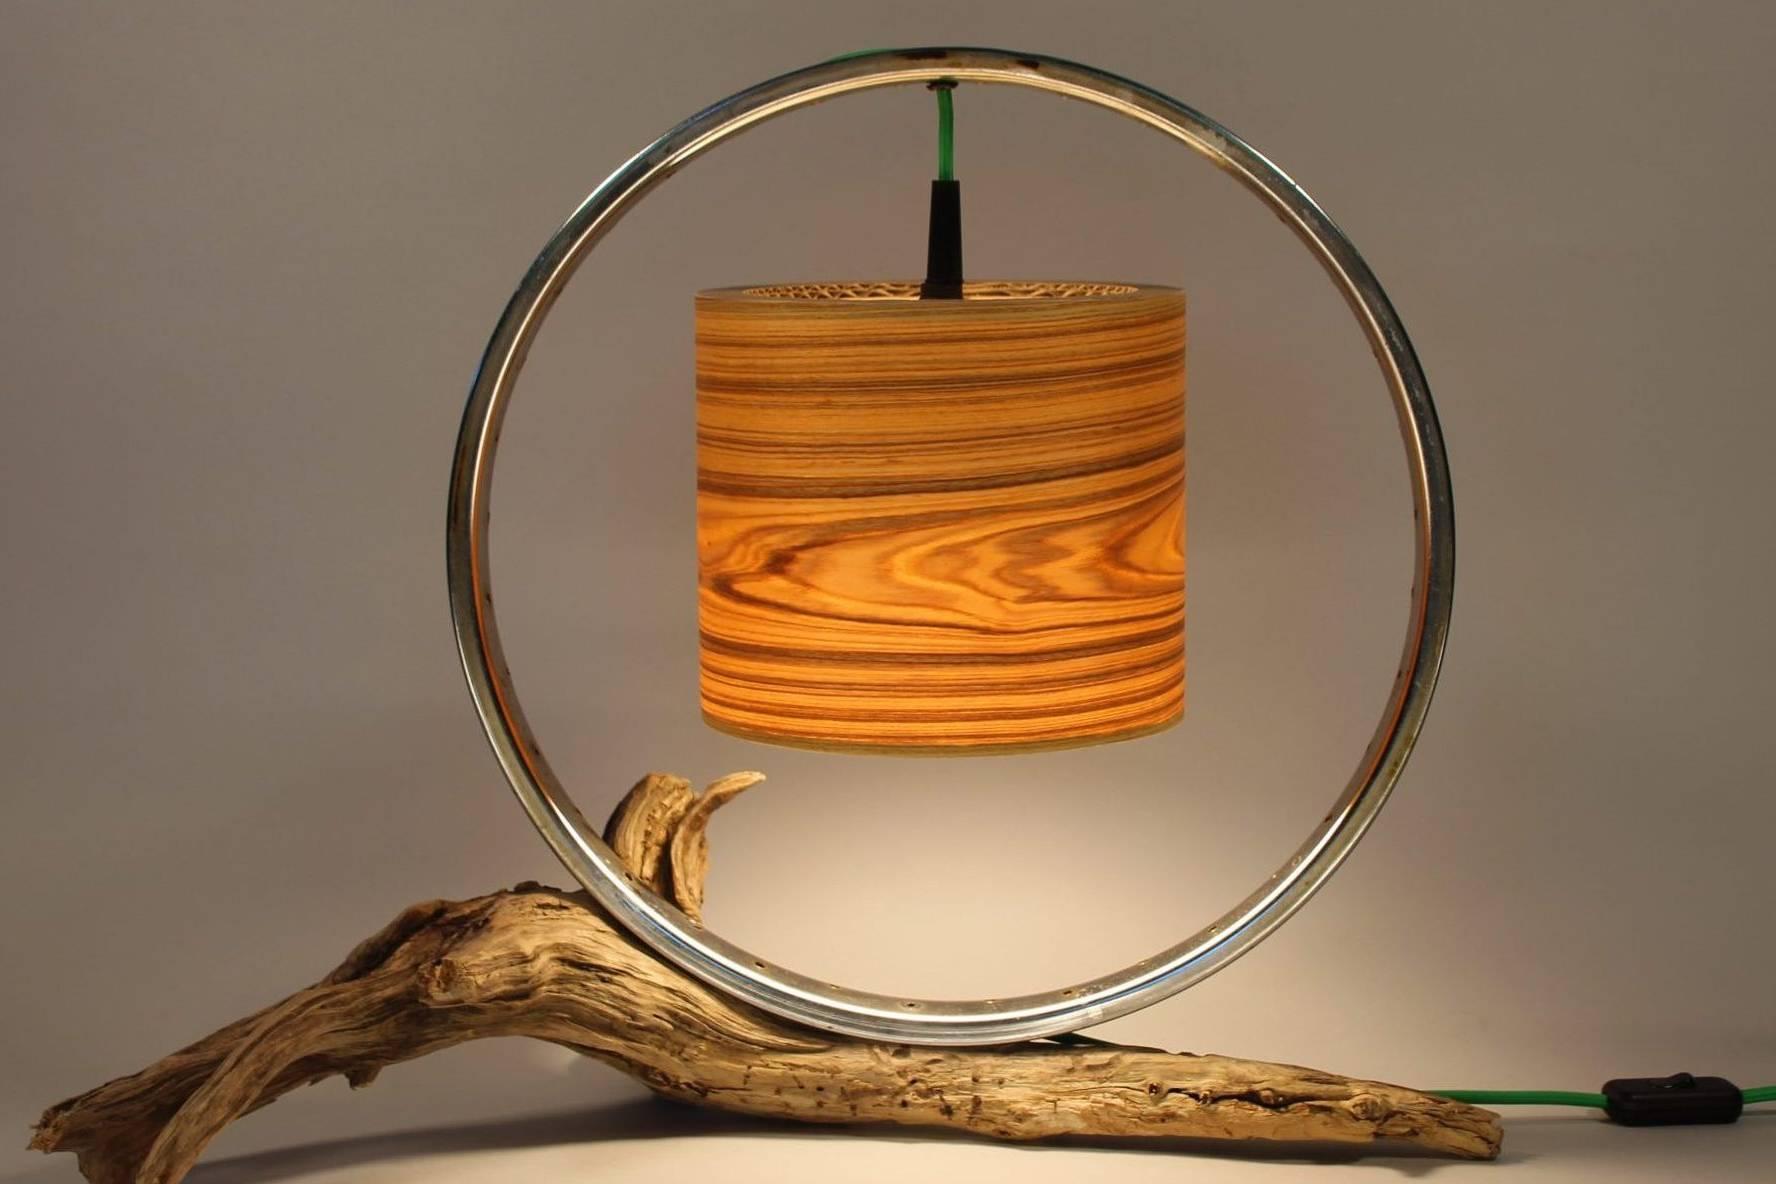 Upcycling-Tischlampe-Birota-original